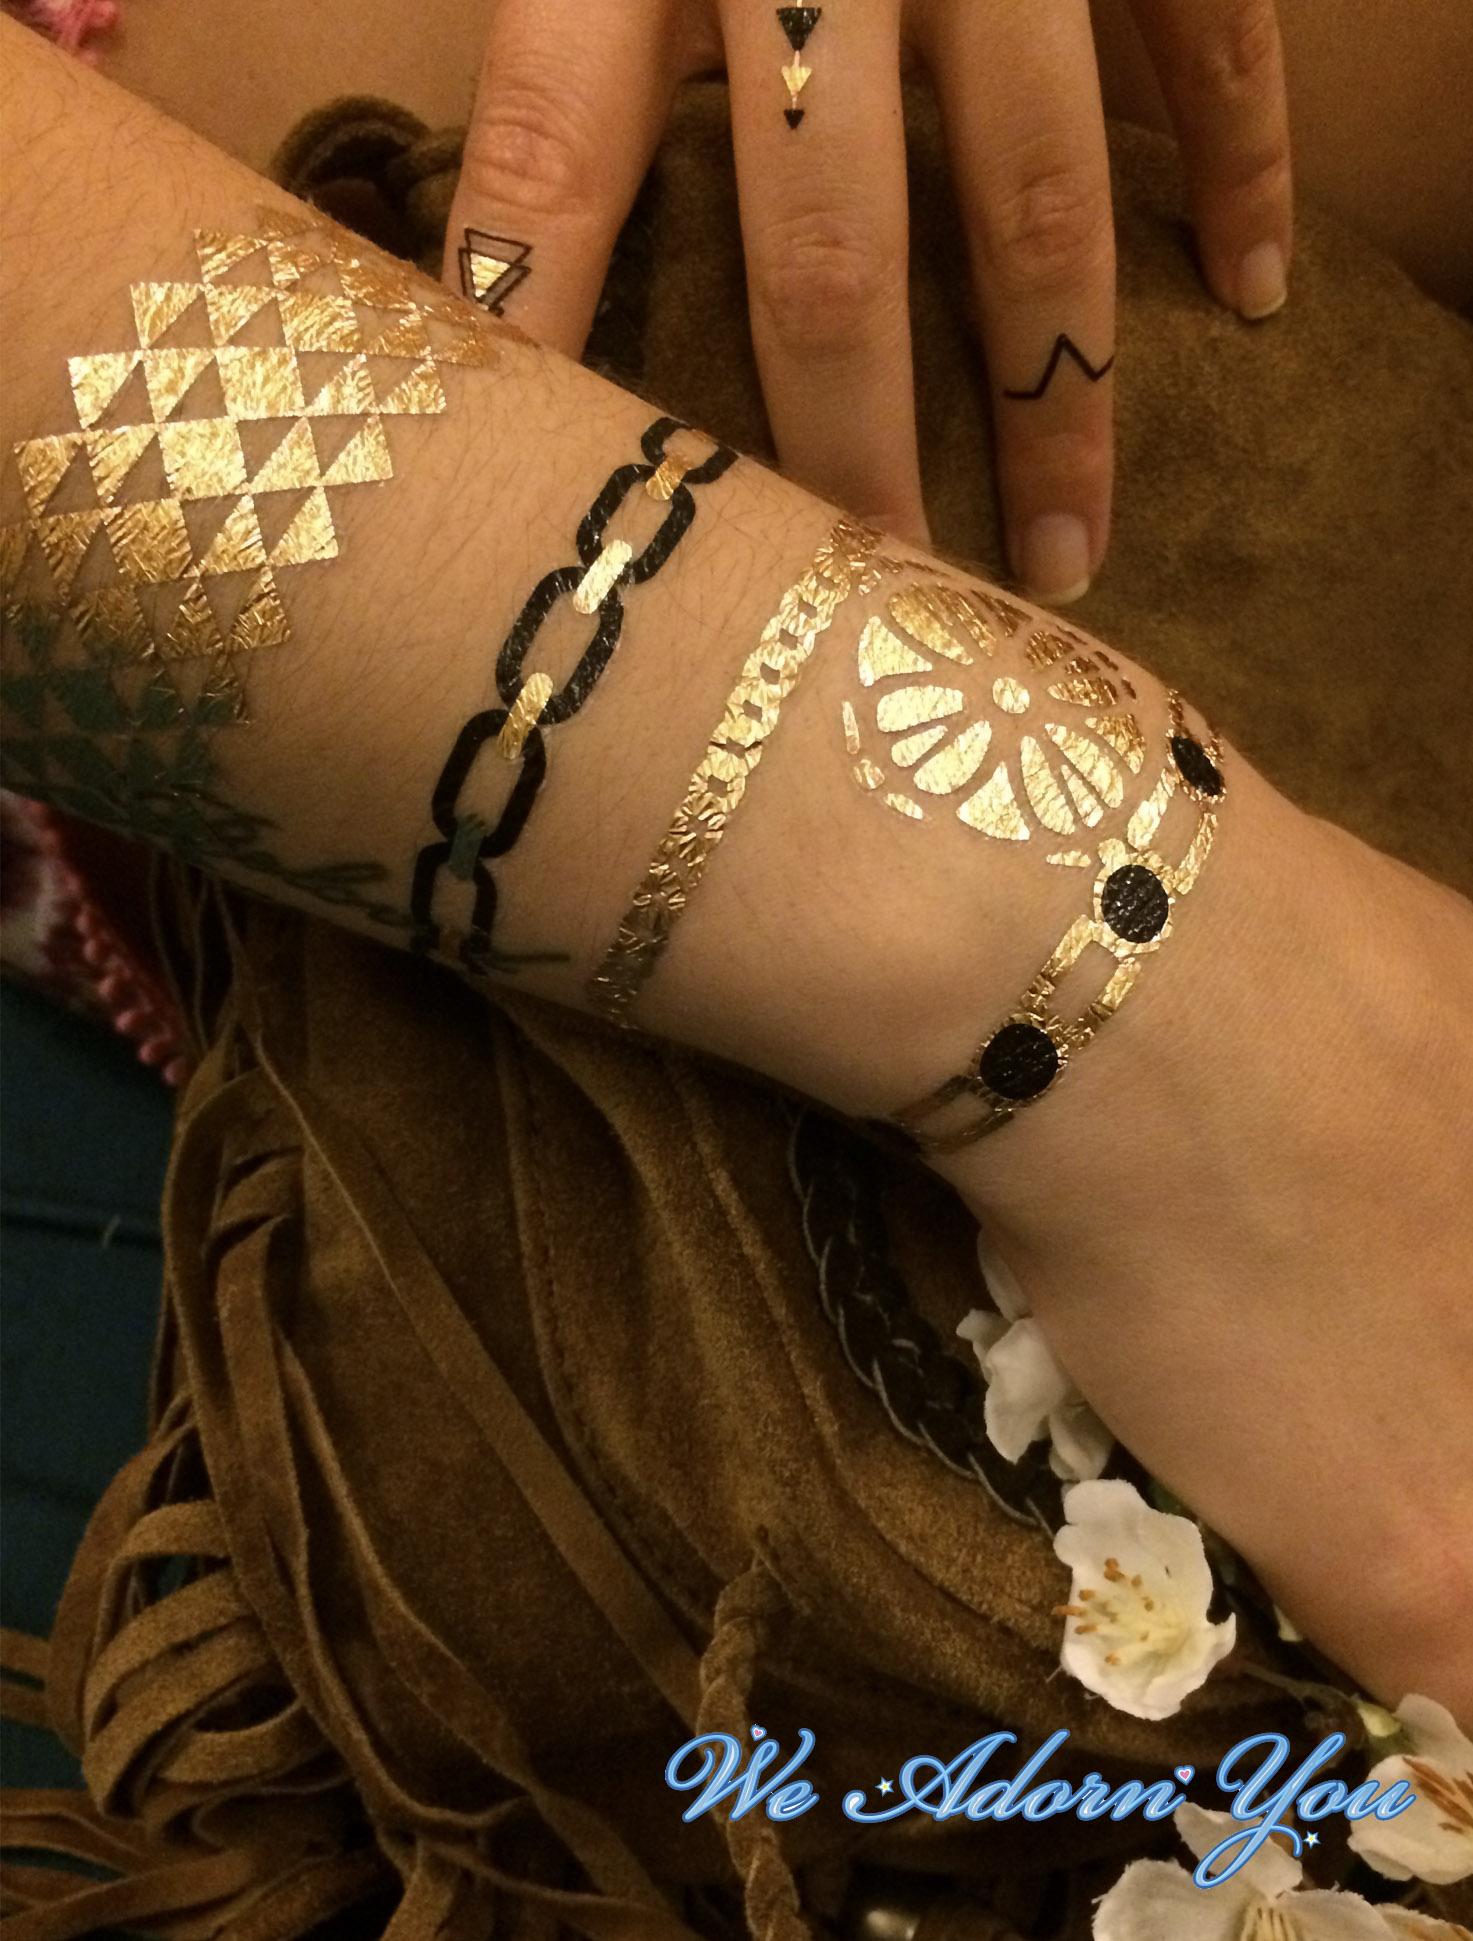 Flash Tattoo Geo Summer - We Adorn You.jpg